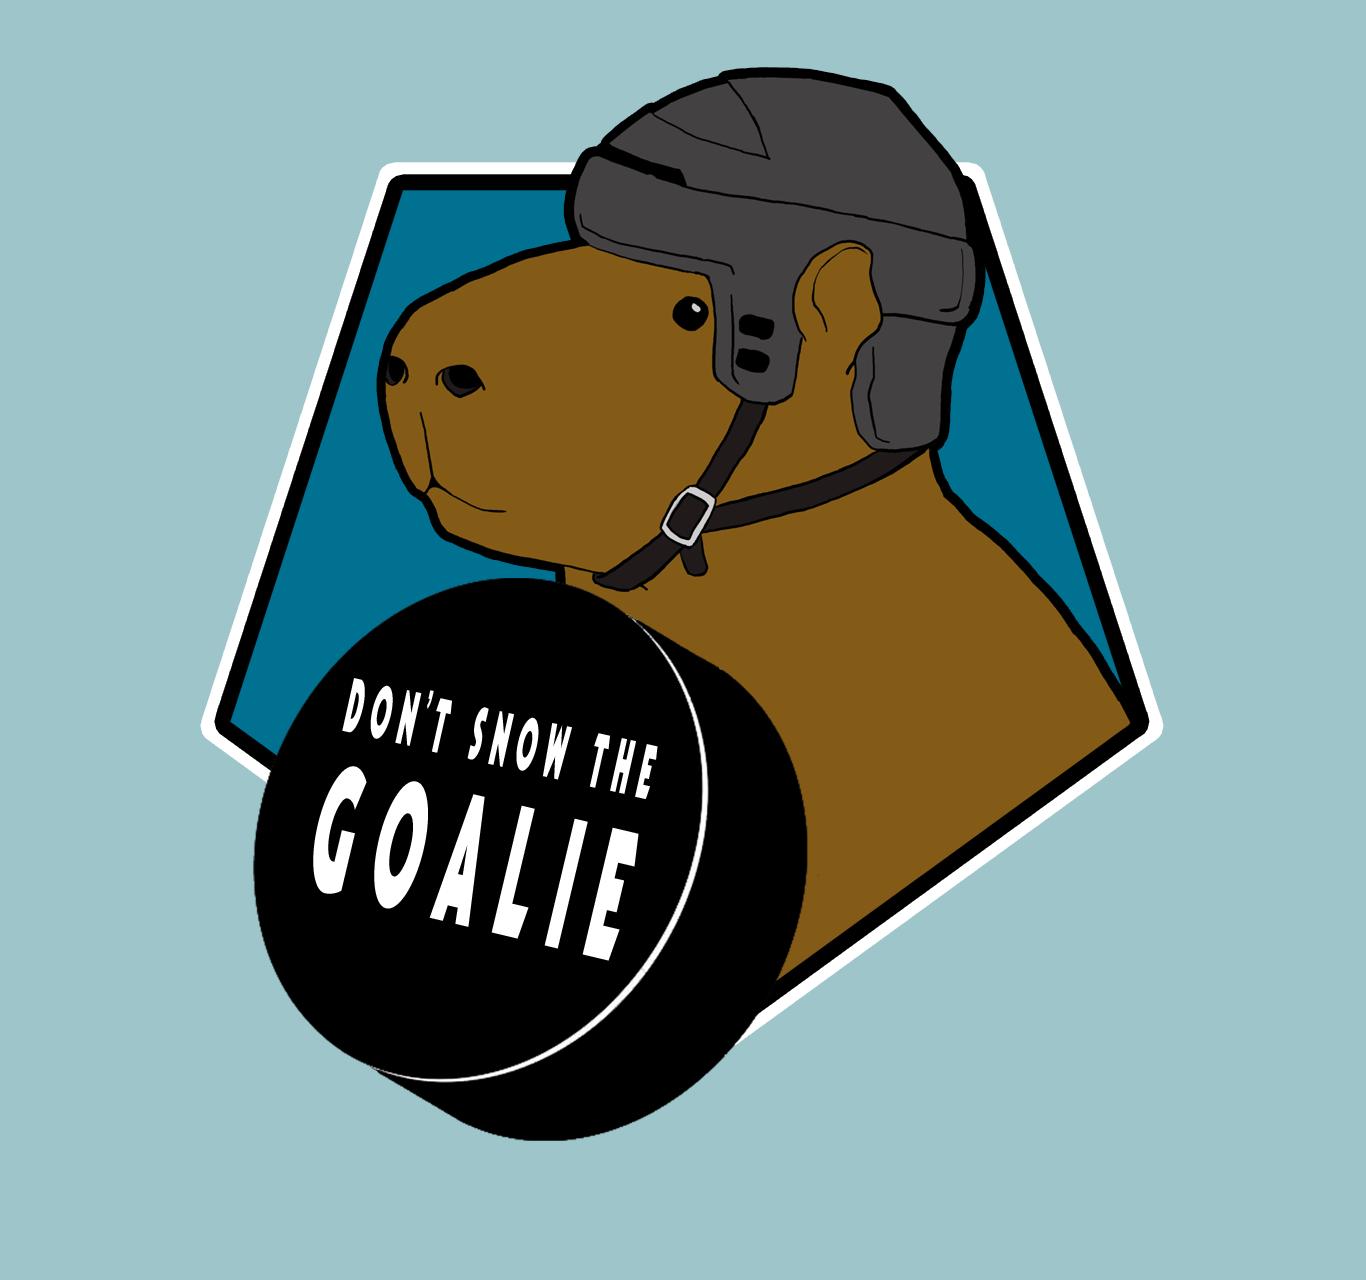 Don't Snow The Goalie logo